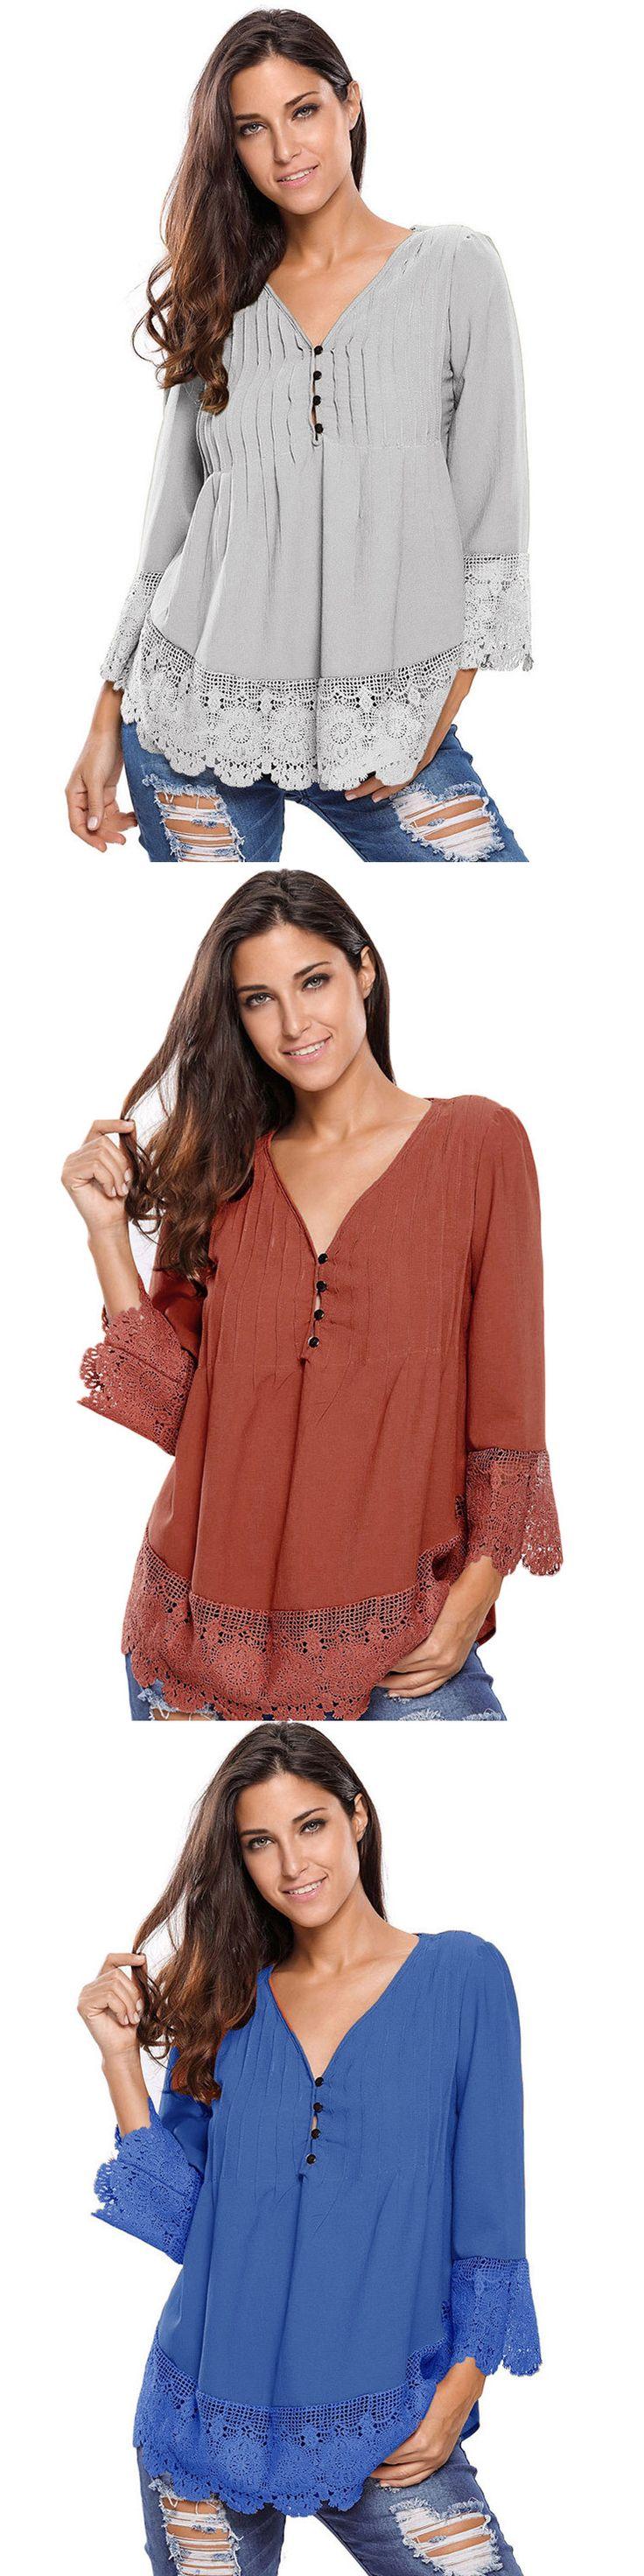 US$18.54 O-Newe Fashion Lace Crochet Stitching V-Neck Blouse For Women